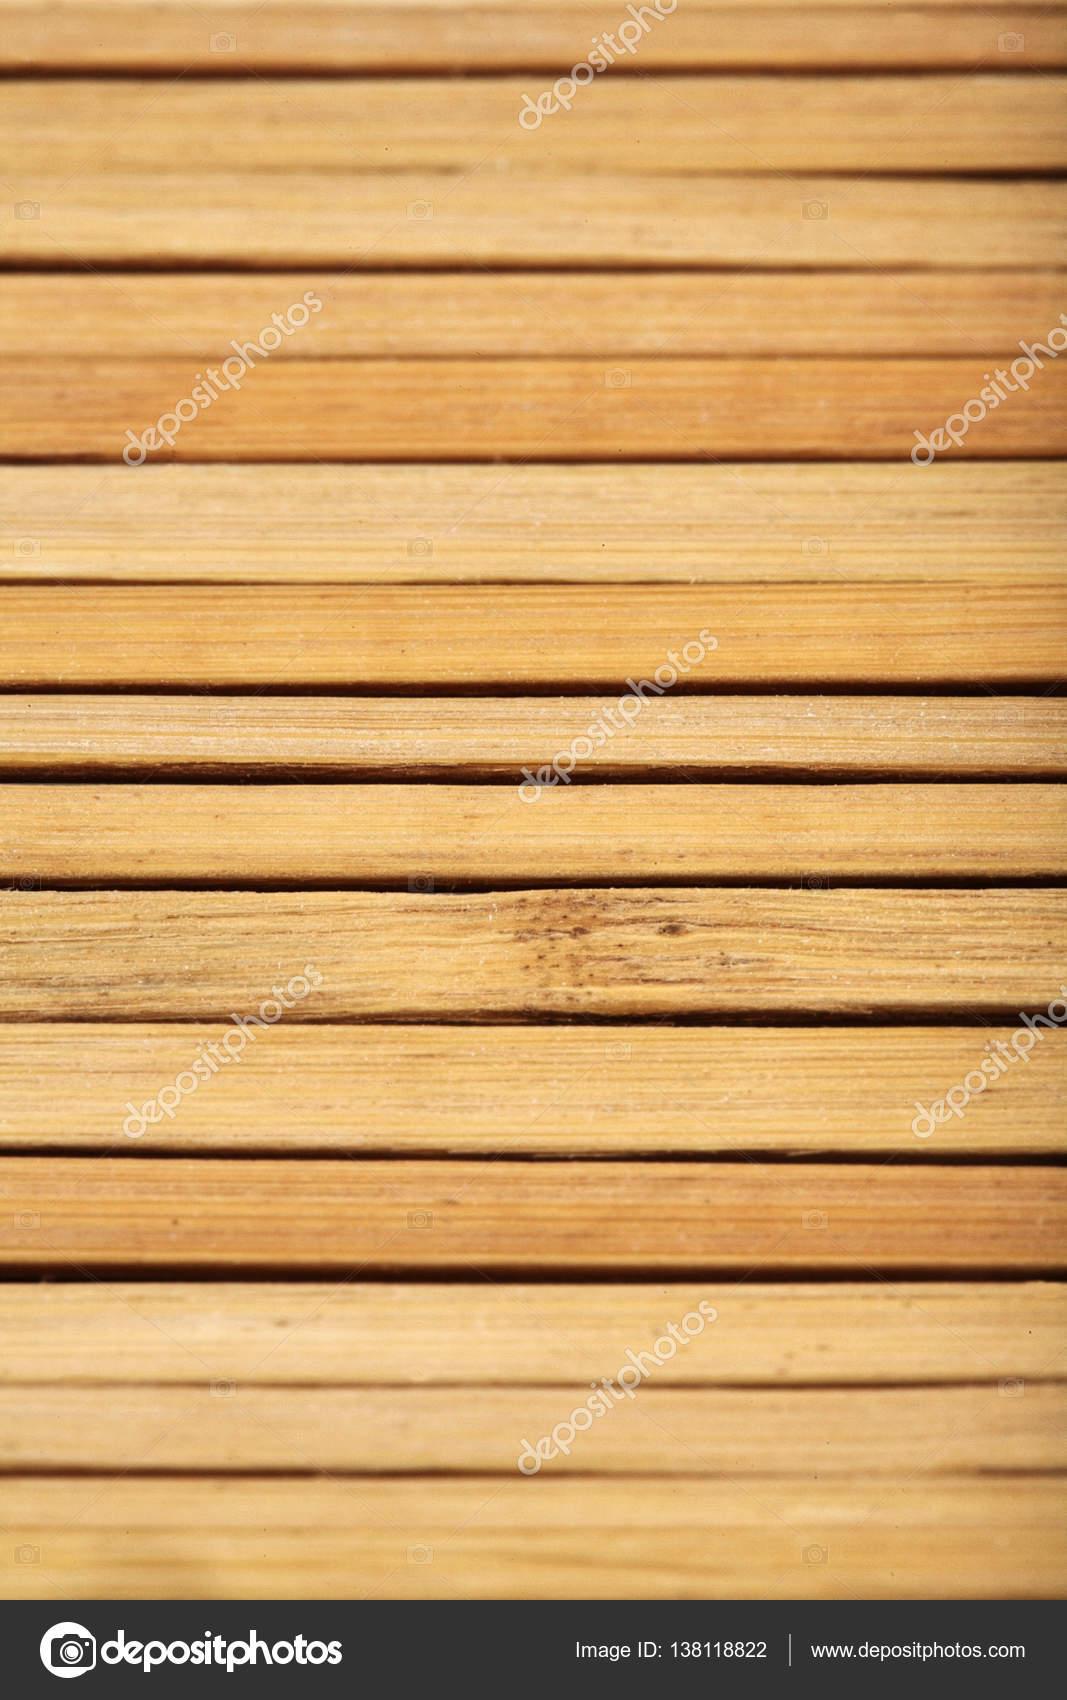 trama tappeto in legno — Foto Stock © londondeposit #138118822